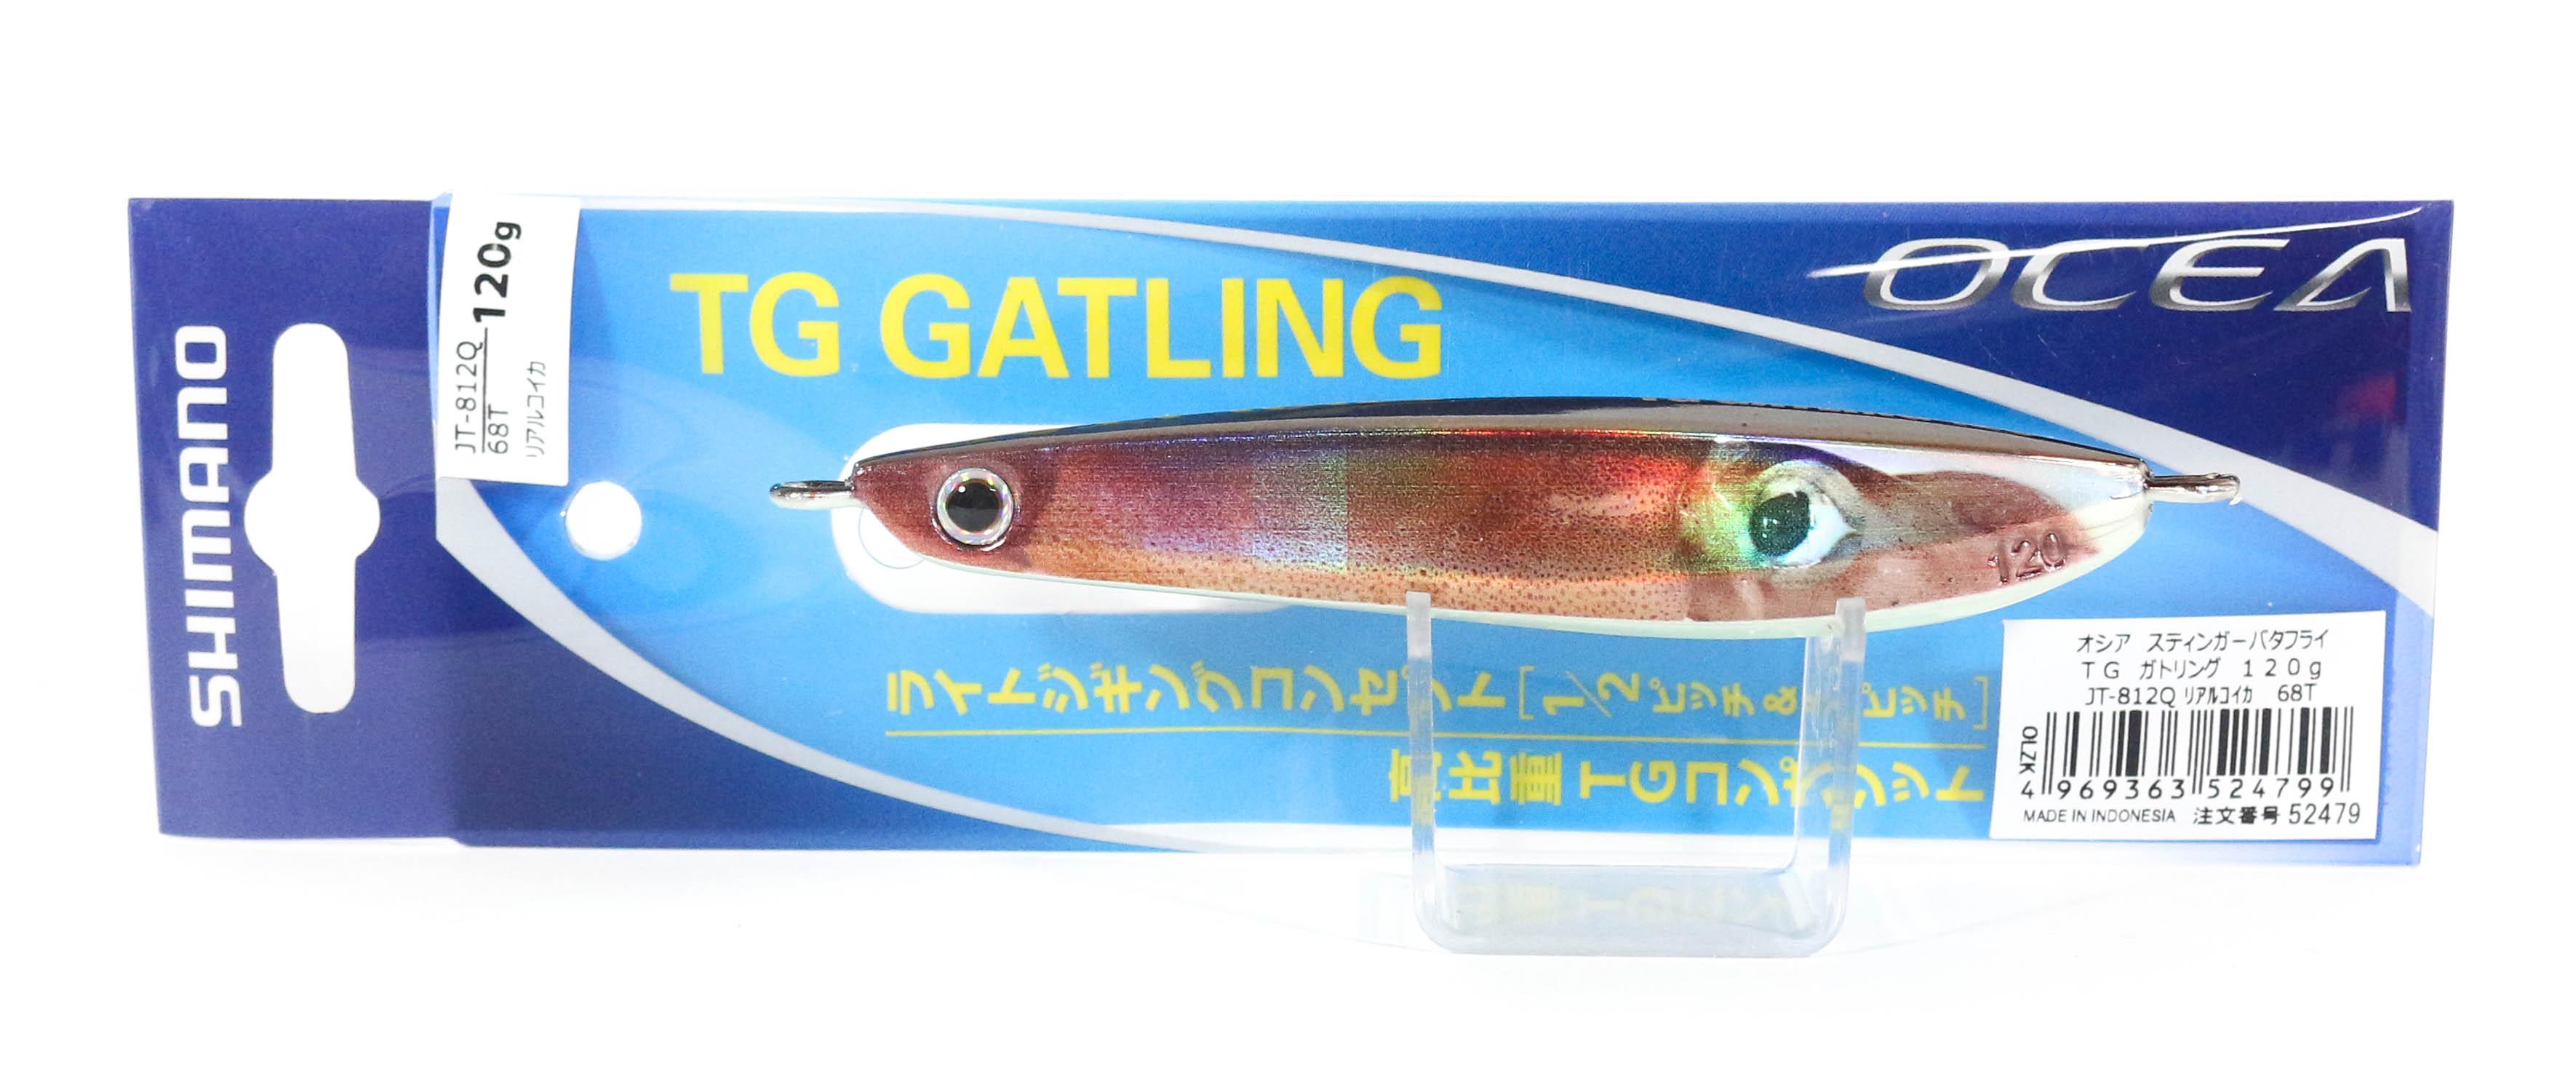 Shimano JT-812Q Metal Jig TG Gatling 120 grams 68T 524799